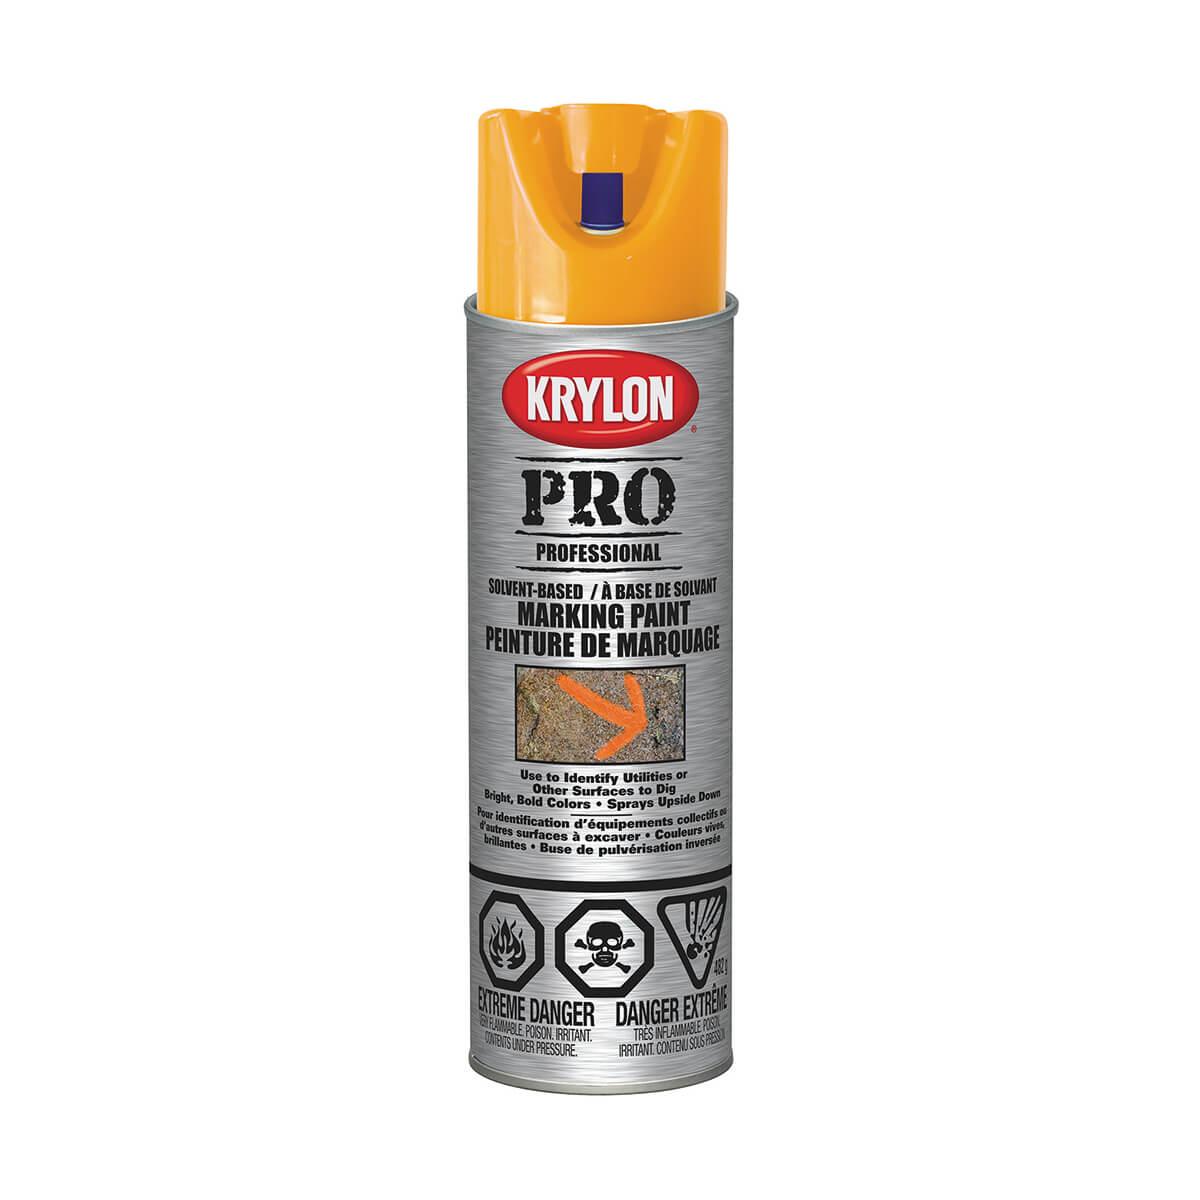 Krylon contractor marking paint, Solvent based, Fluorescent Orange - 482 g